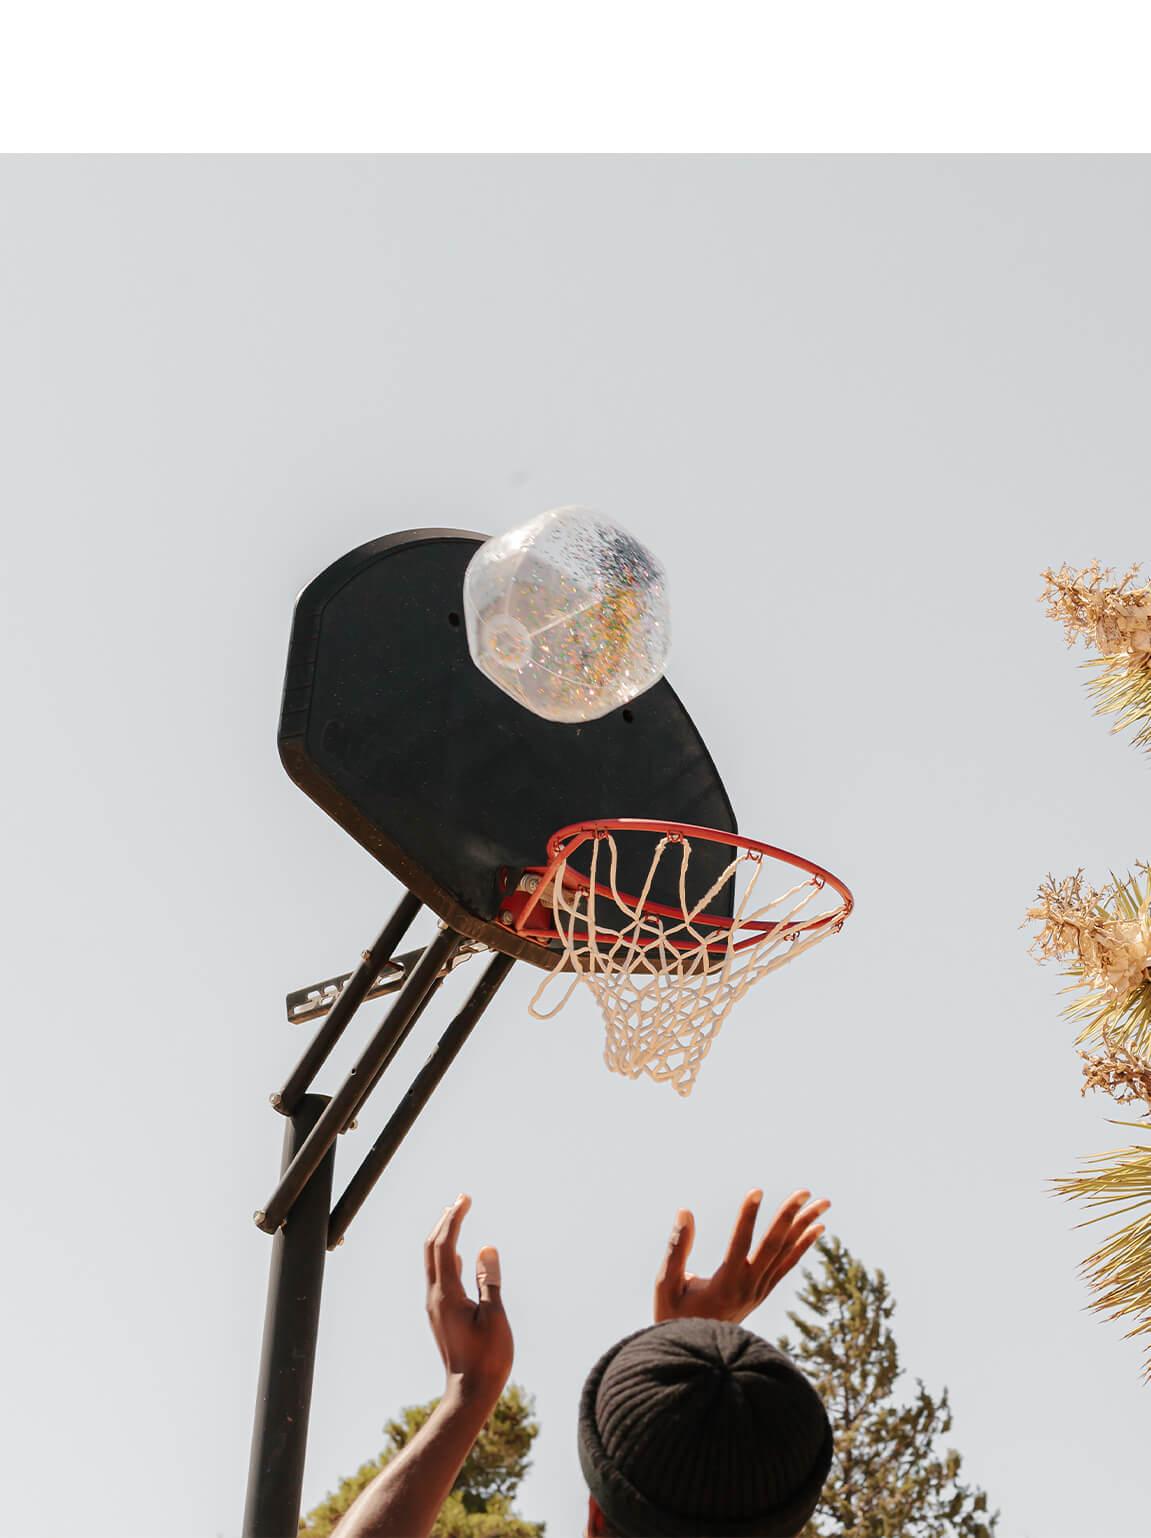 Photo by Brandon Lopez of hands shooting glittery beach ball into basketball hoop